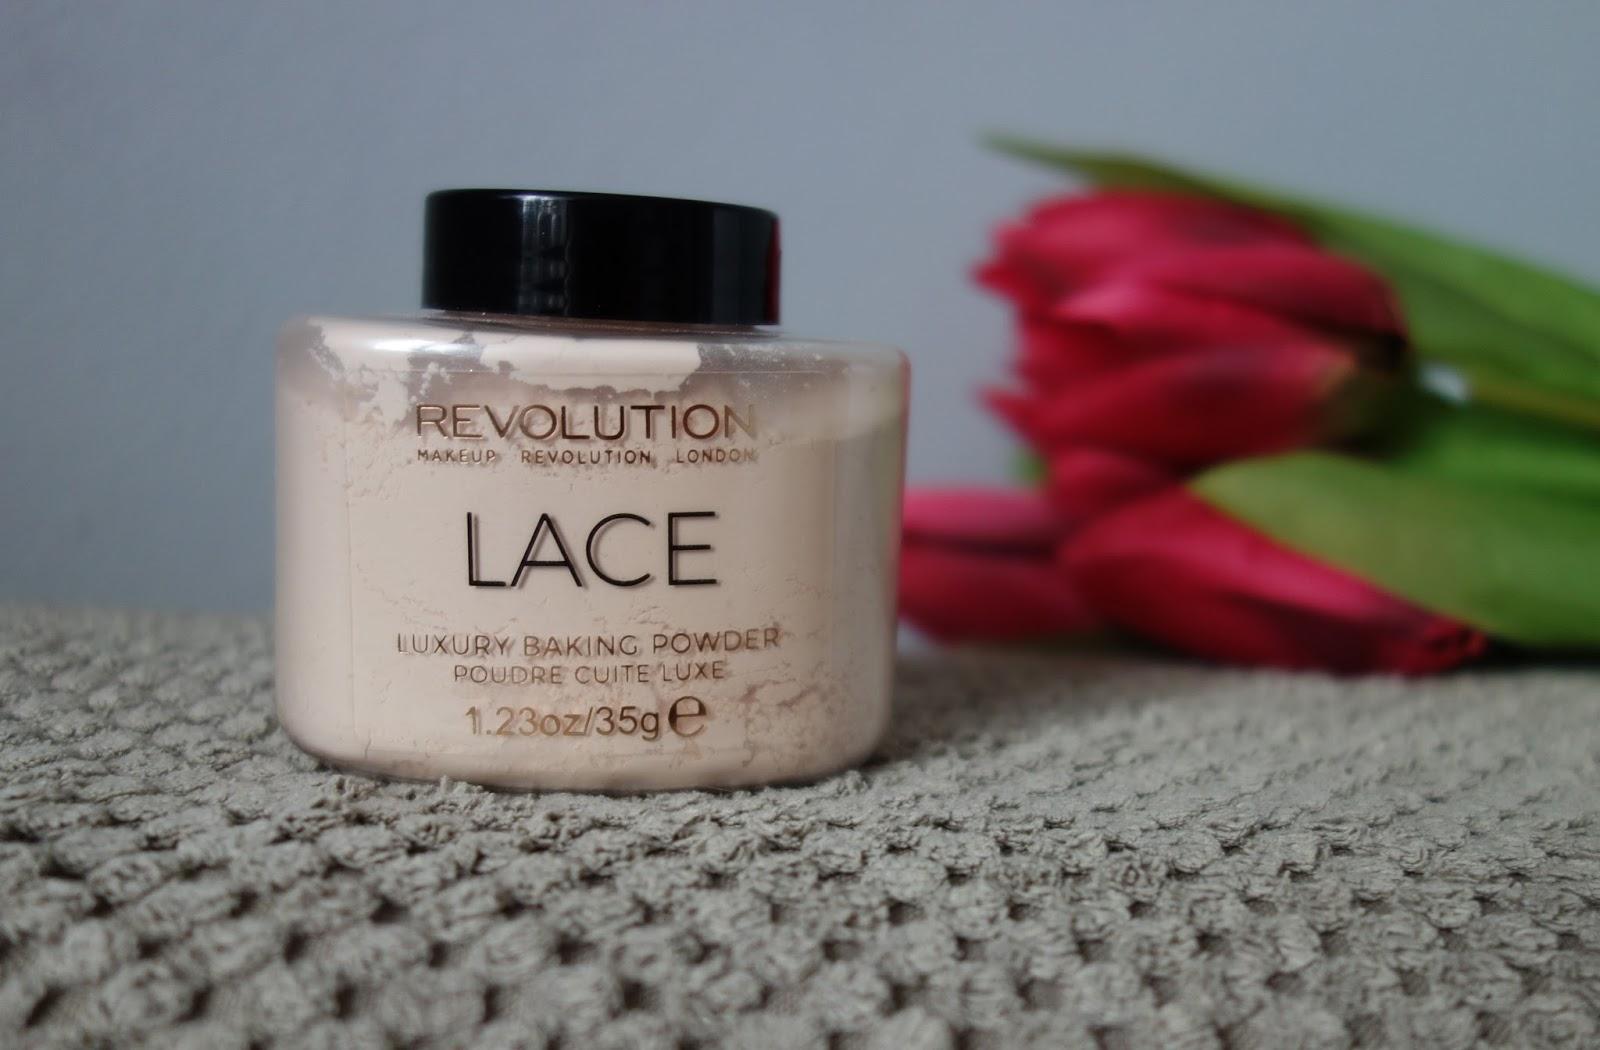 Makeup Revolution Baking Powder LACE - warto czy nie warto?